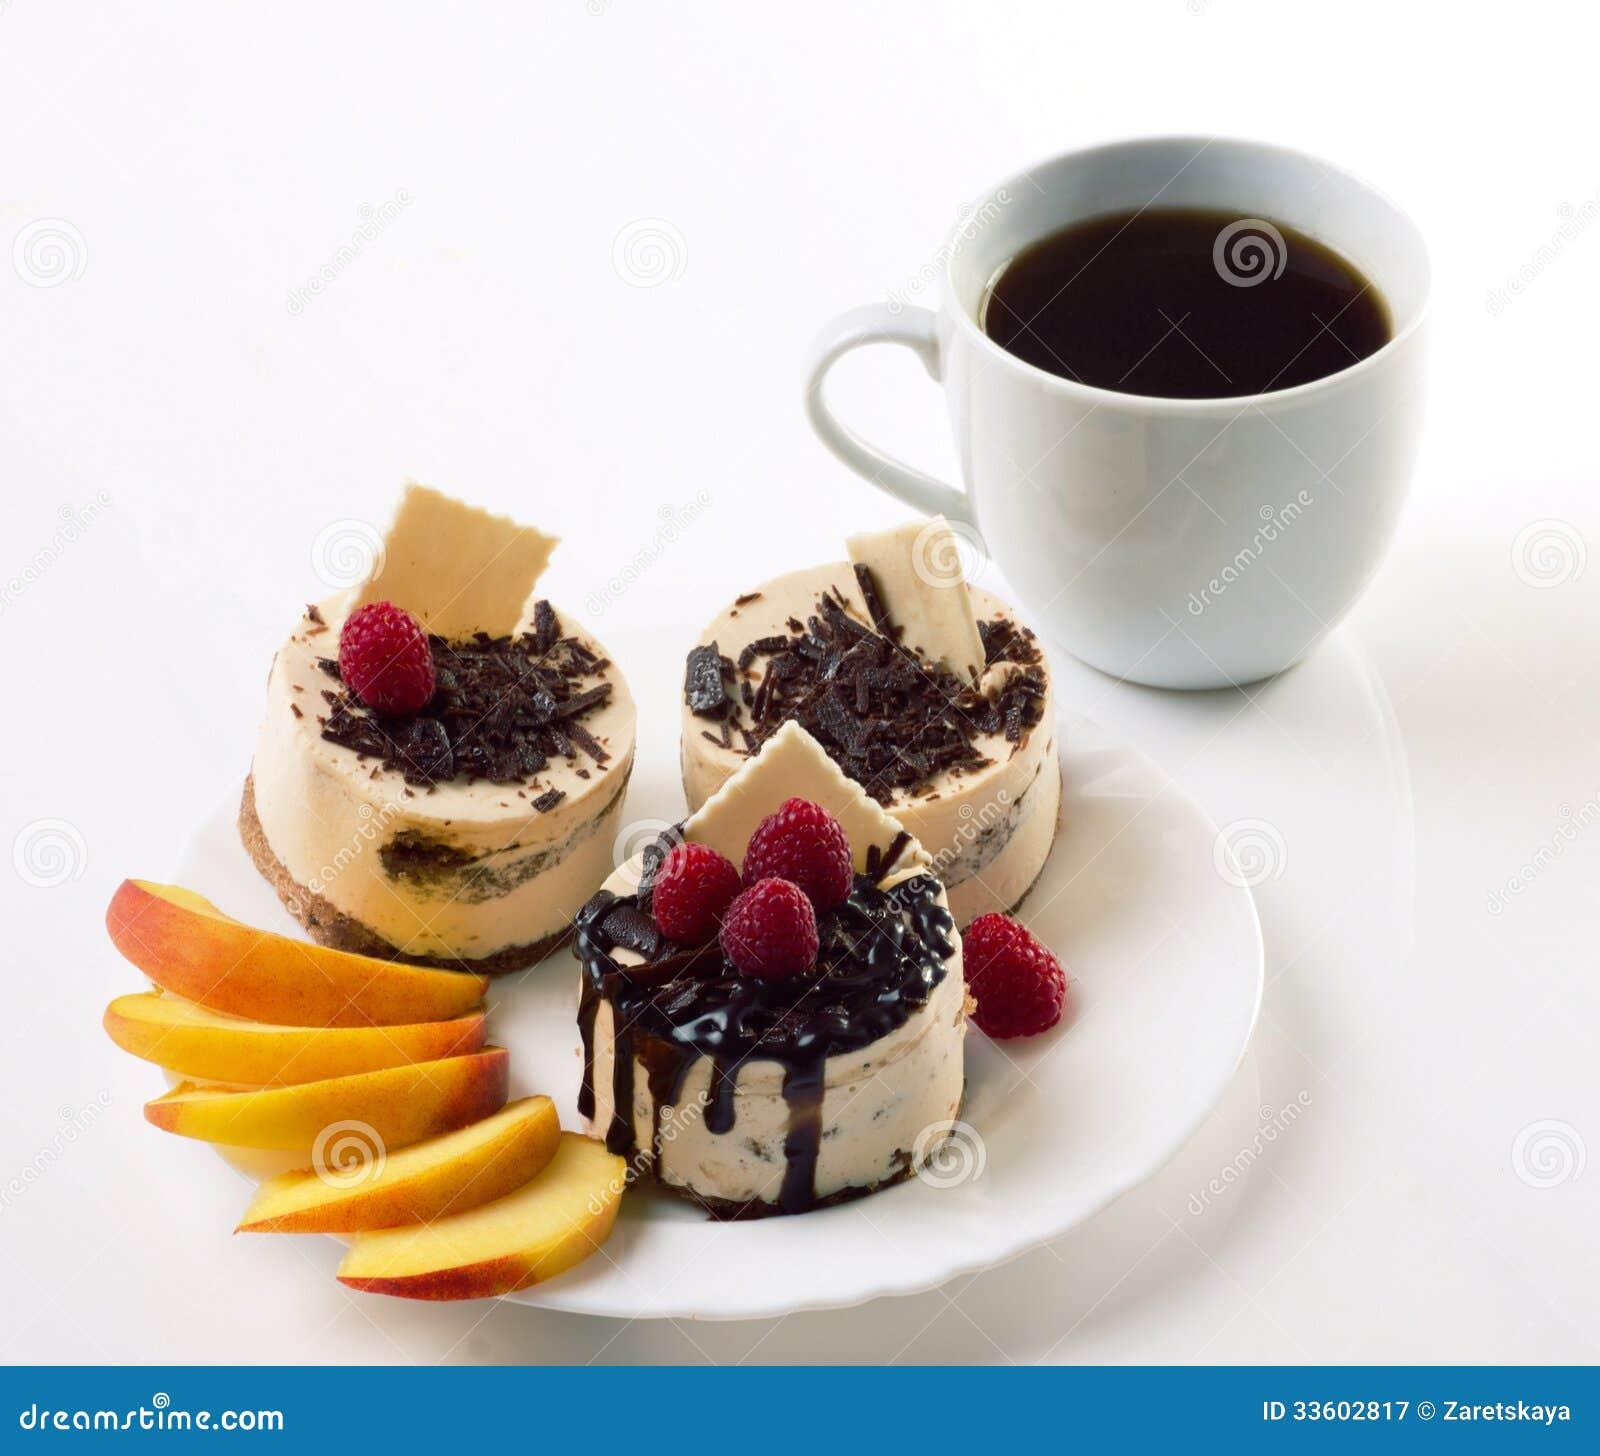 Raspberry Chocolate Espresso Cake